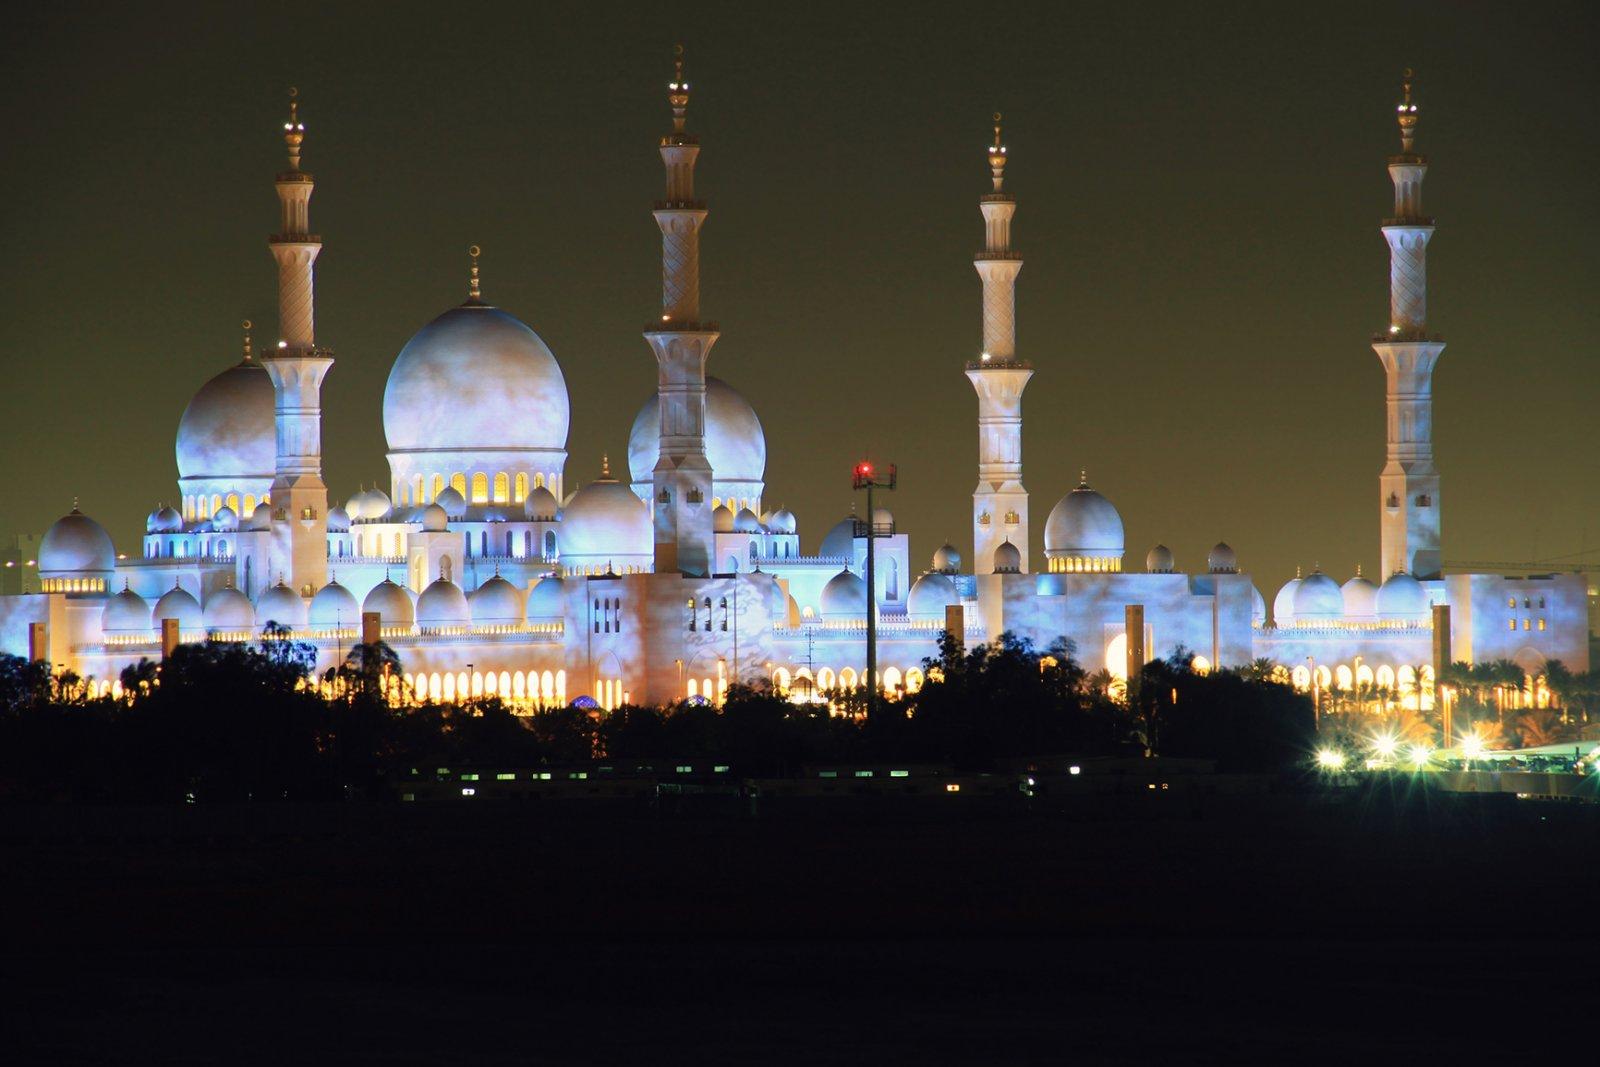 Центр исламской культуры — мечеть шейха Зайда